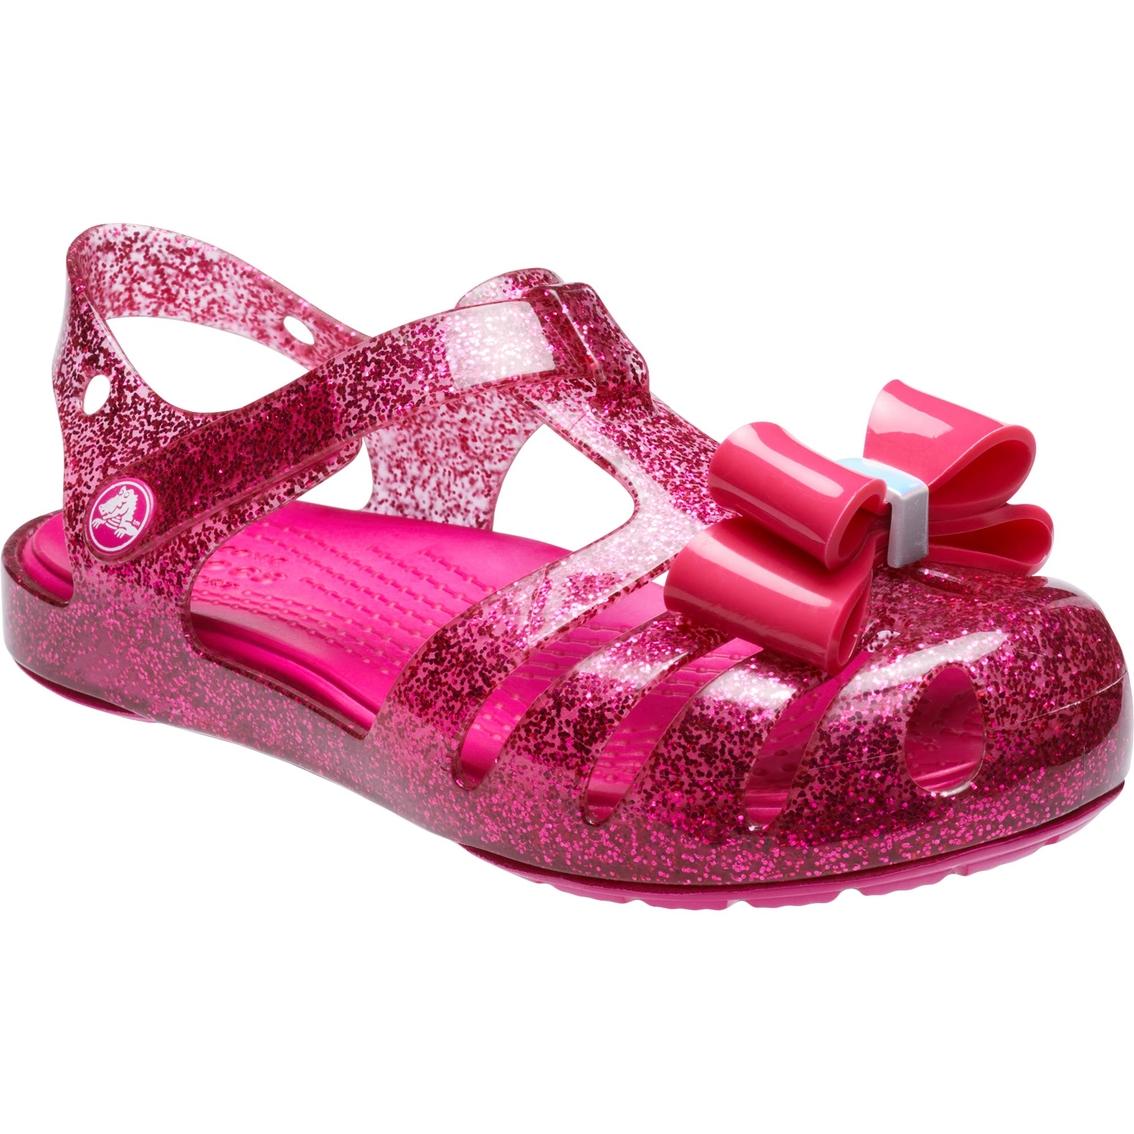 Crocs Preschool Girls Isabella Bow